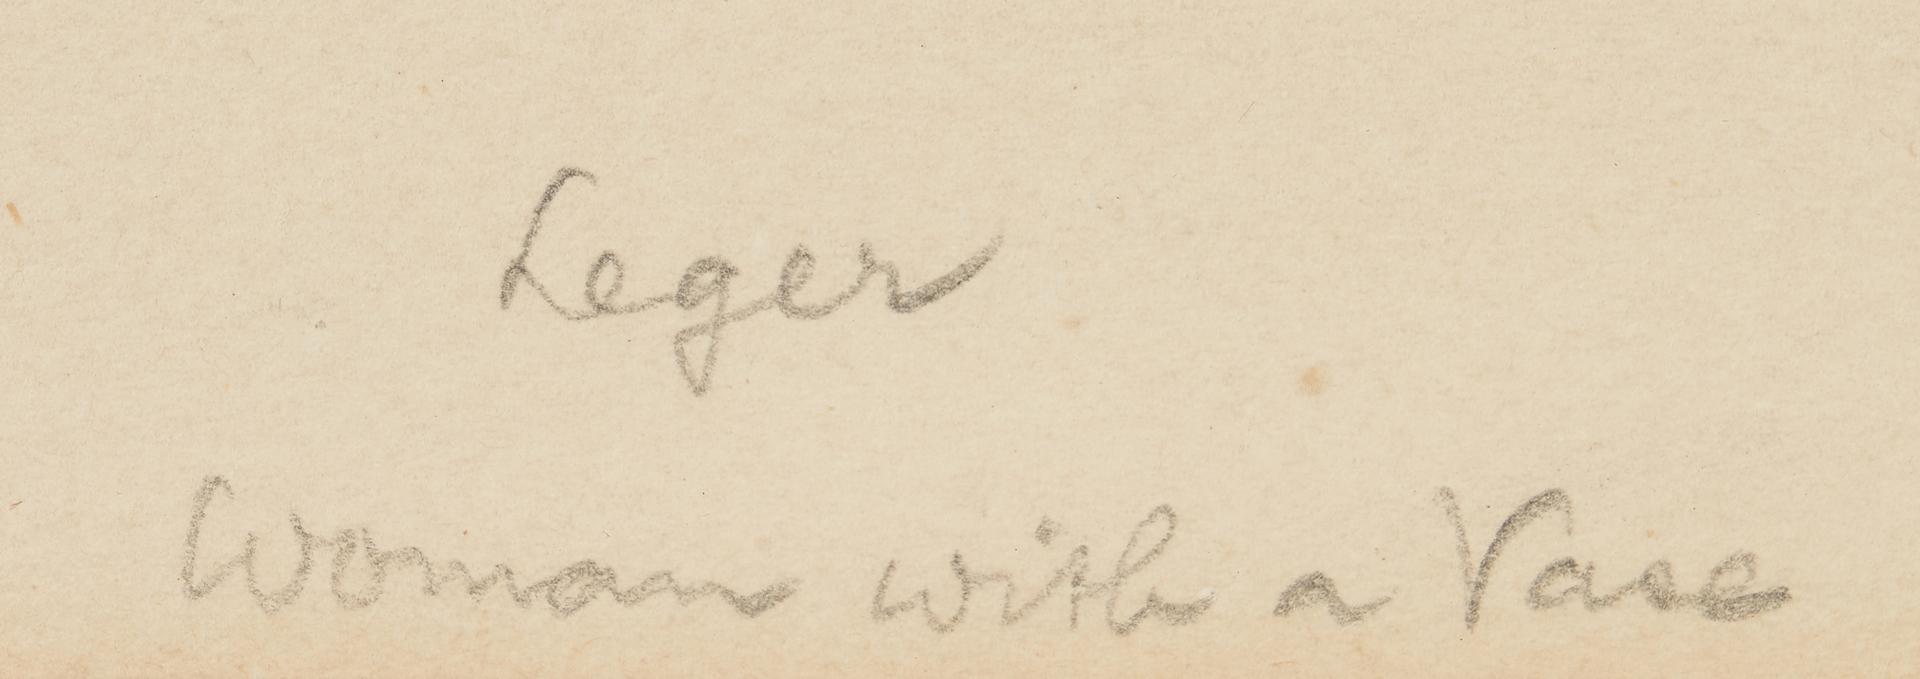 Lot 878: J. Villon after Fernand Leger, Woman with a Jar